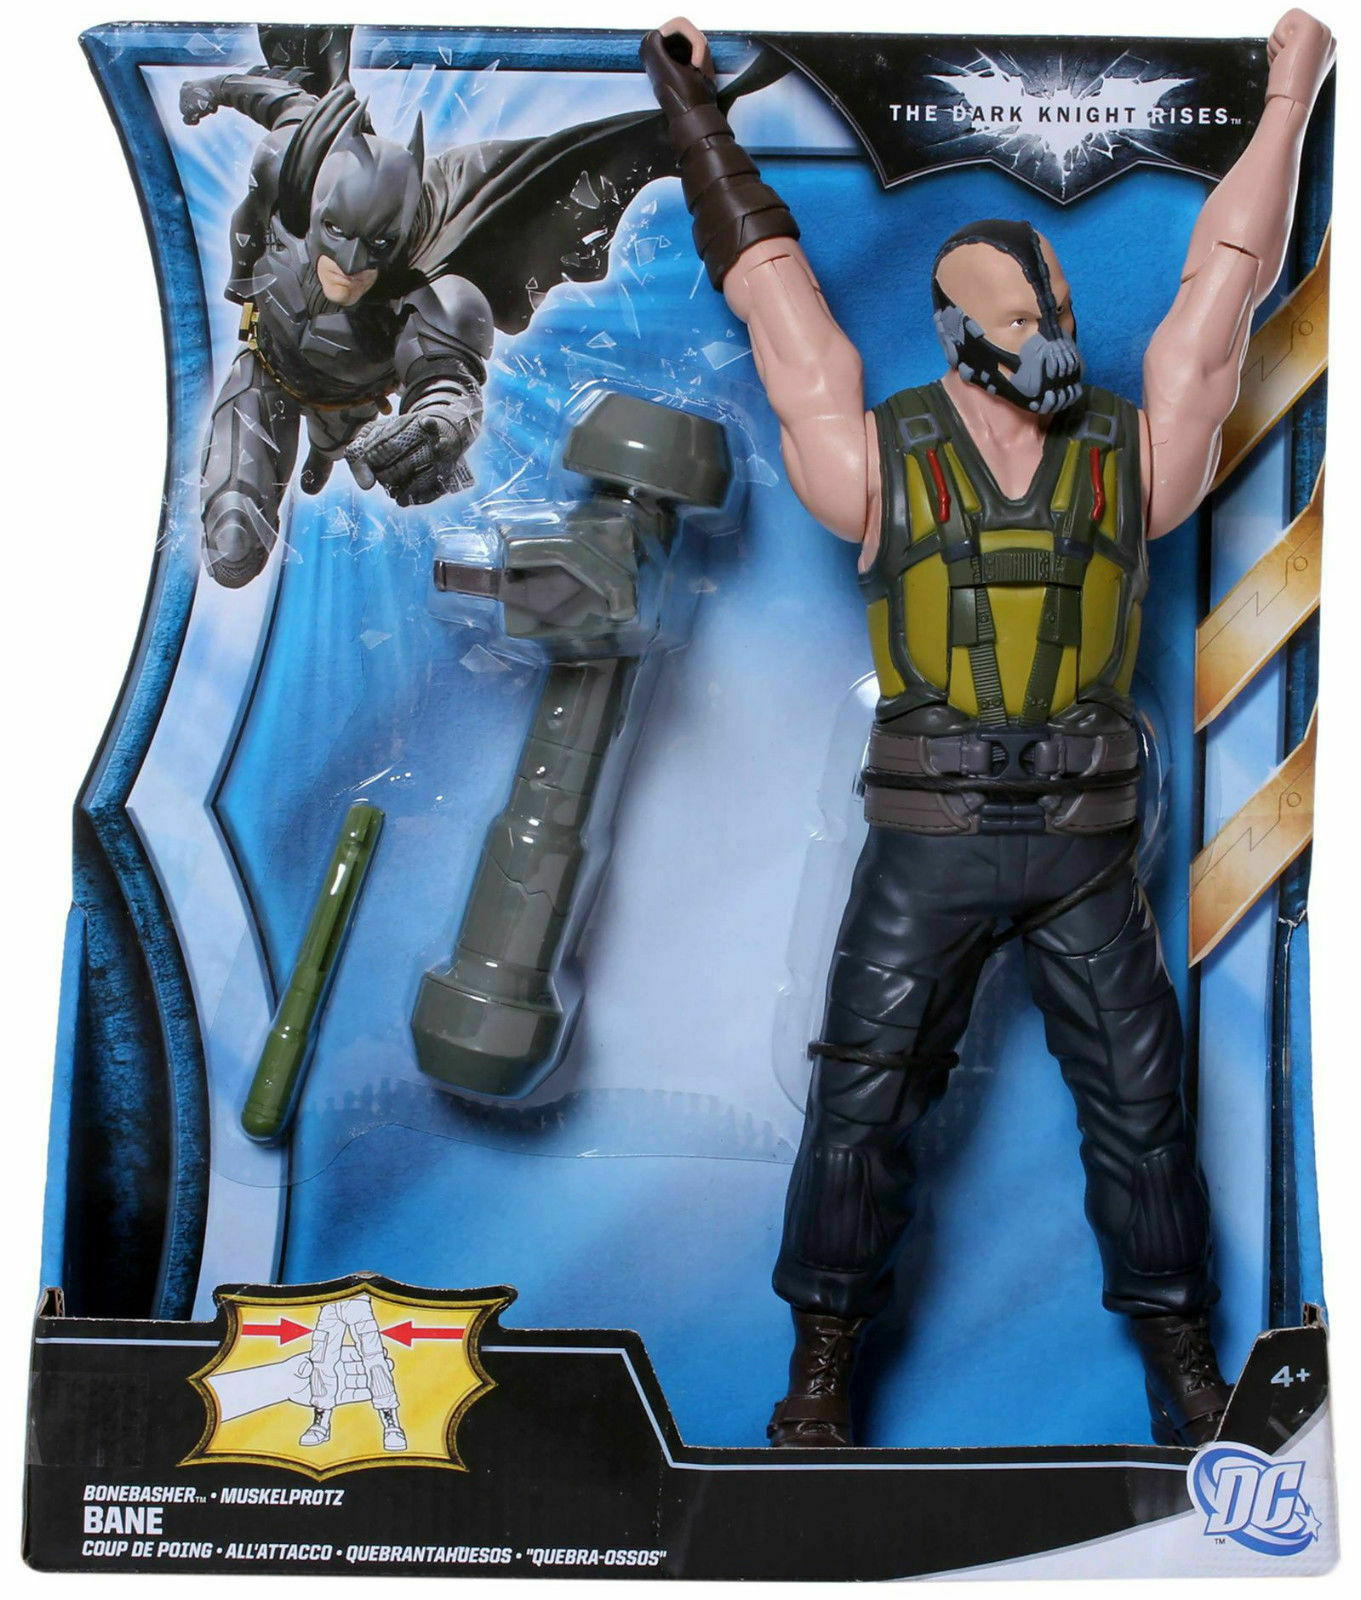 Batman The Dark Knight Rises Deluxe Action Figure - Bonebasher